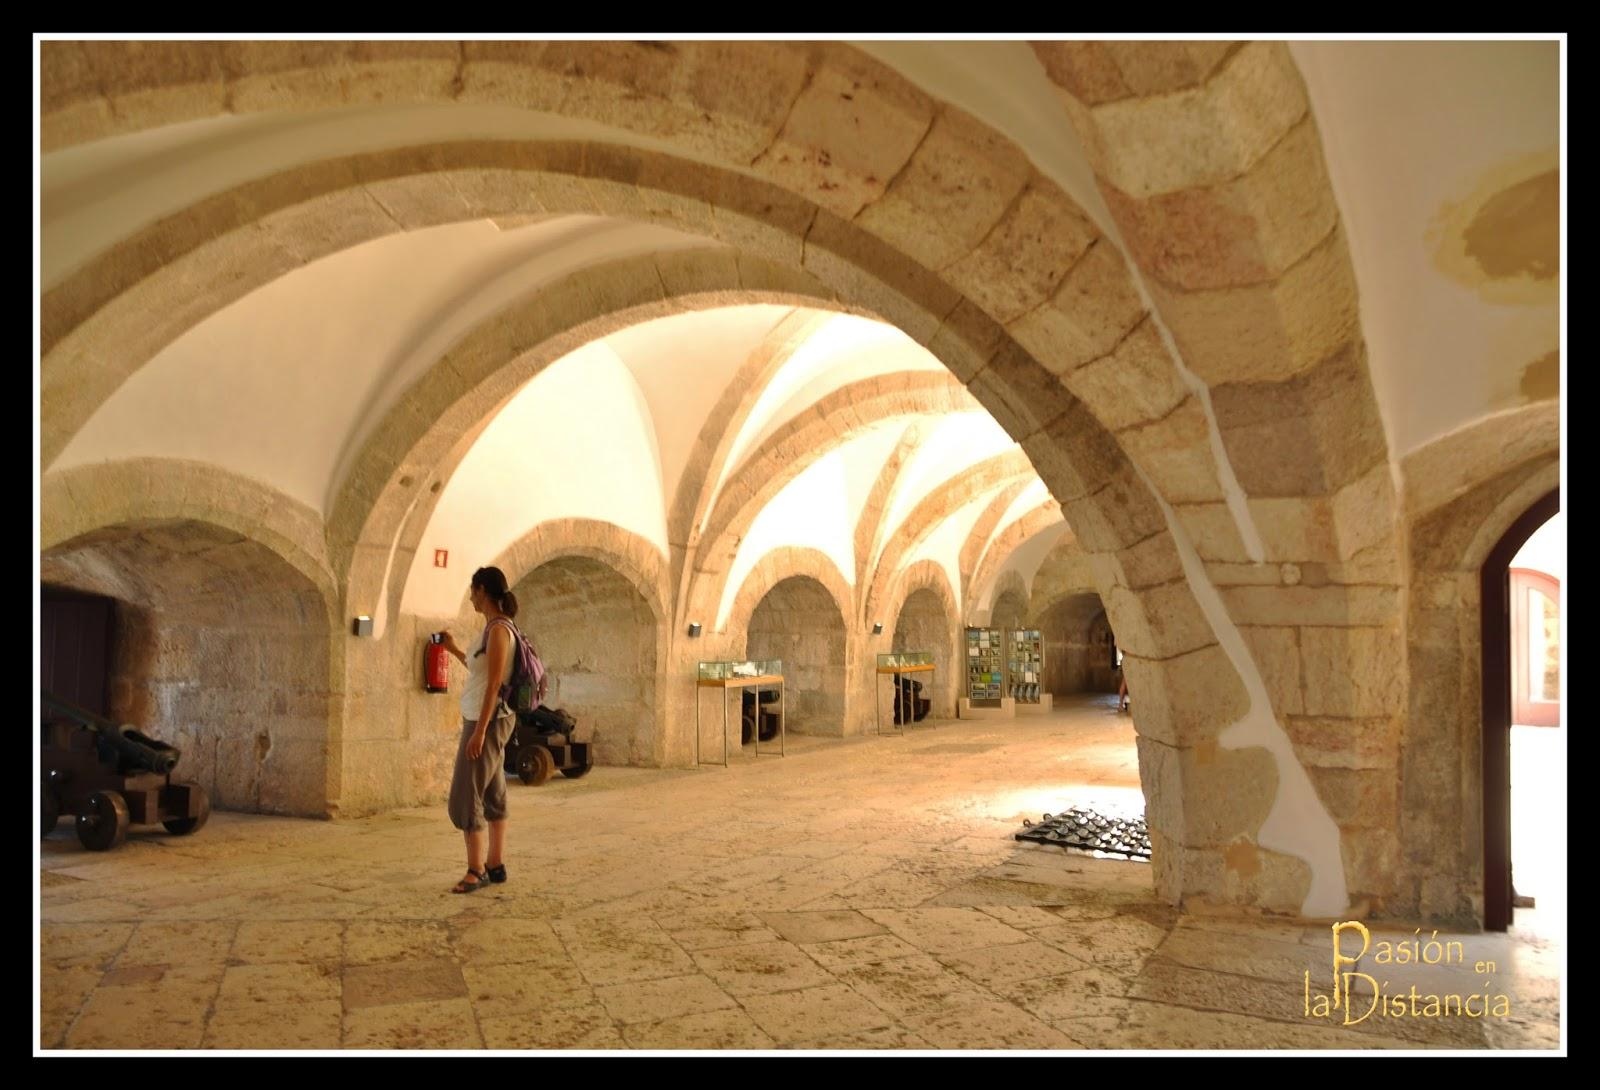 Interior del baluarte defensivo de la Torre de Belém